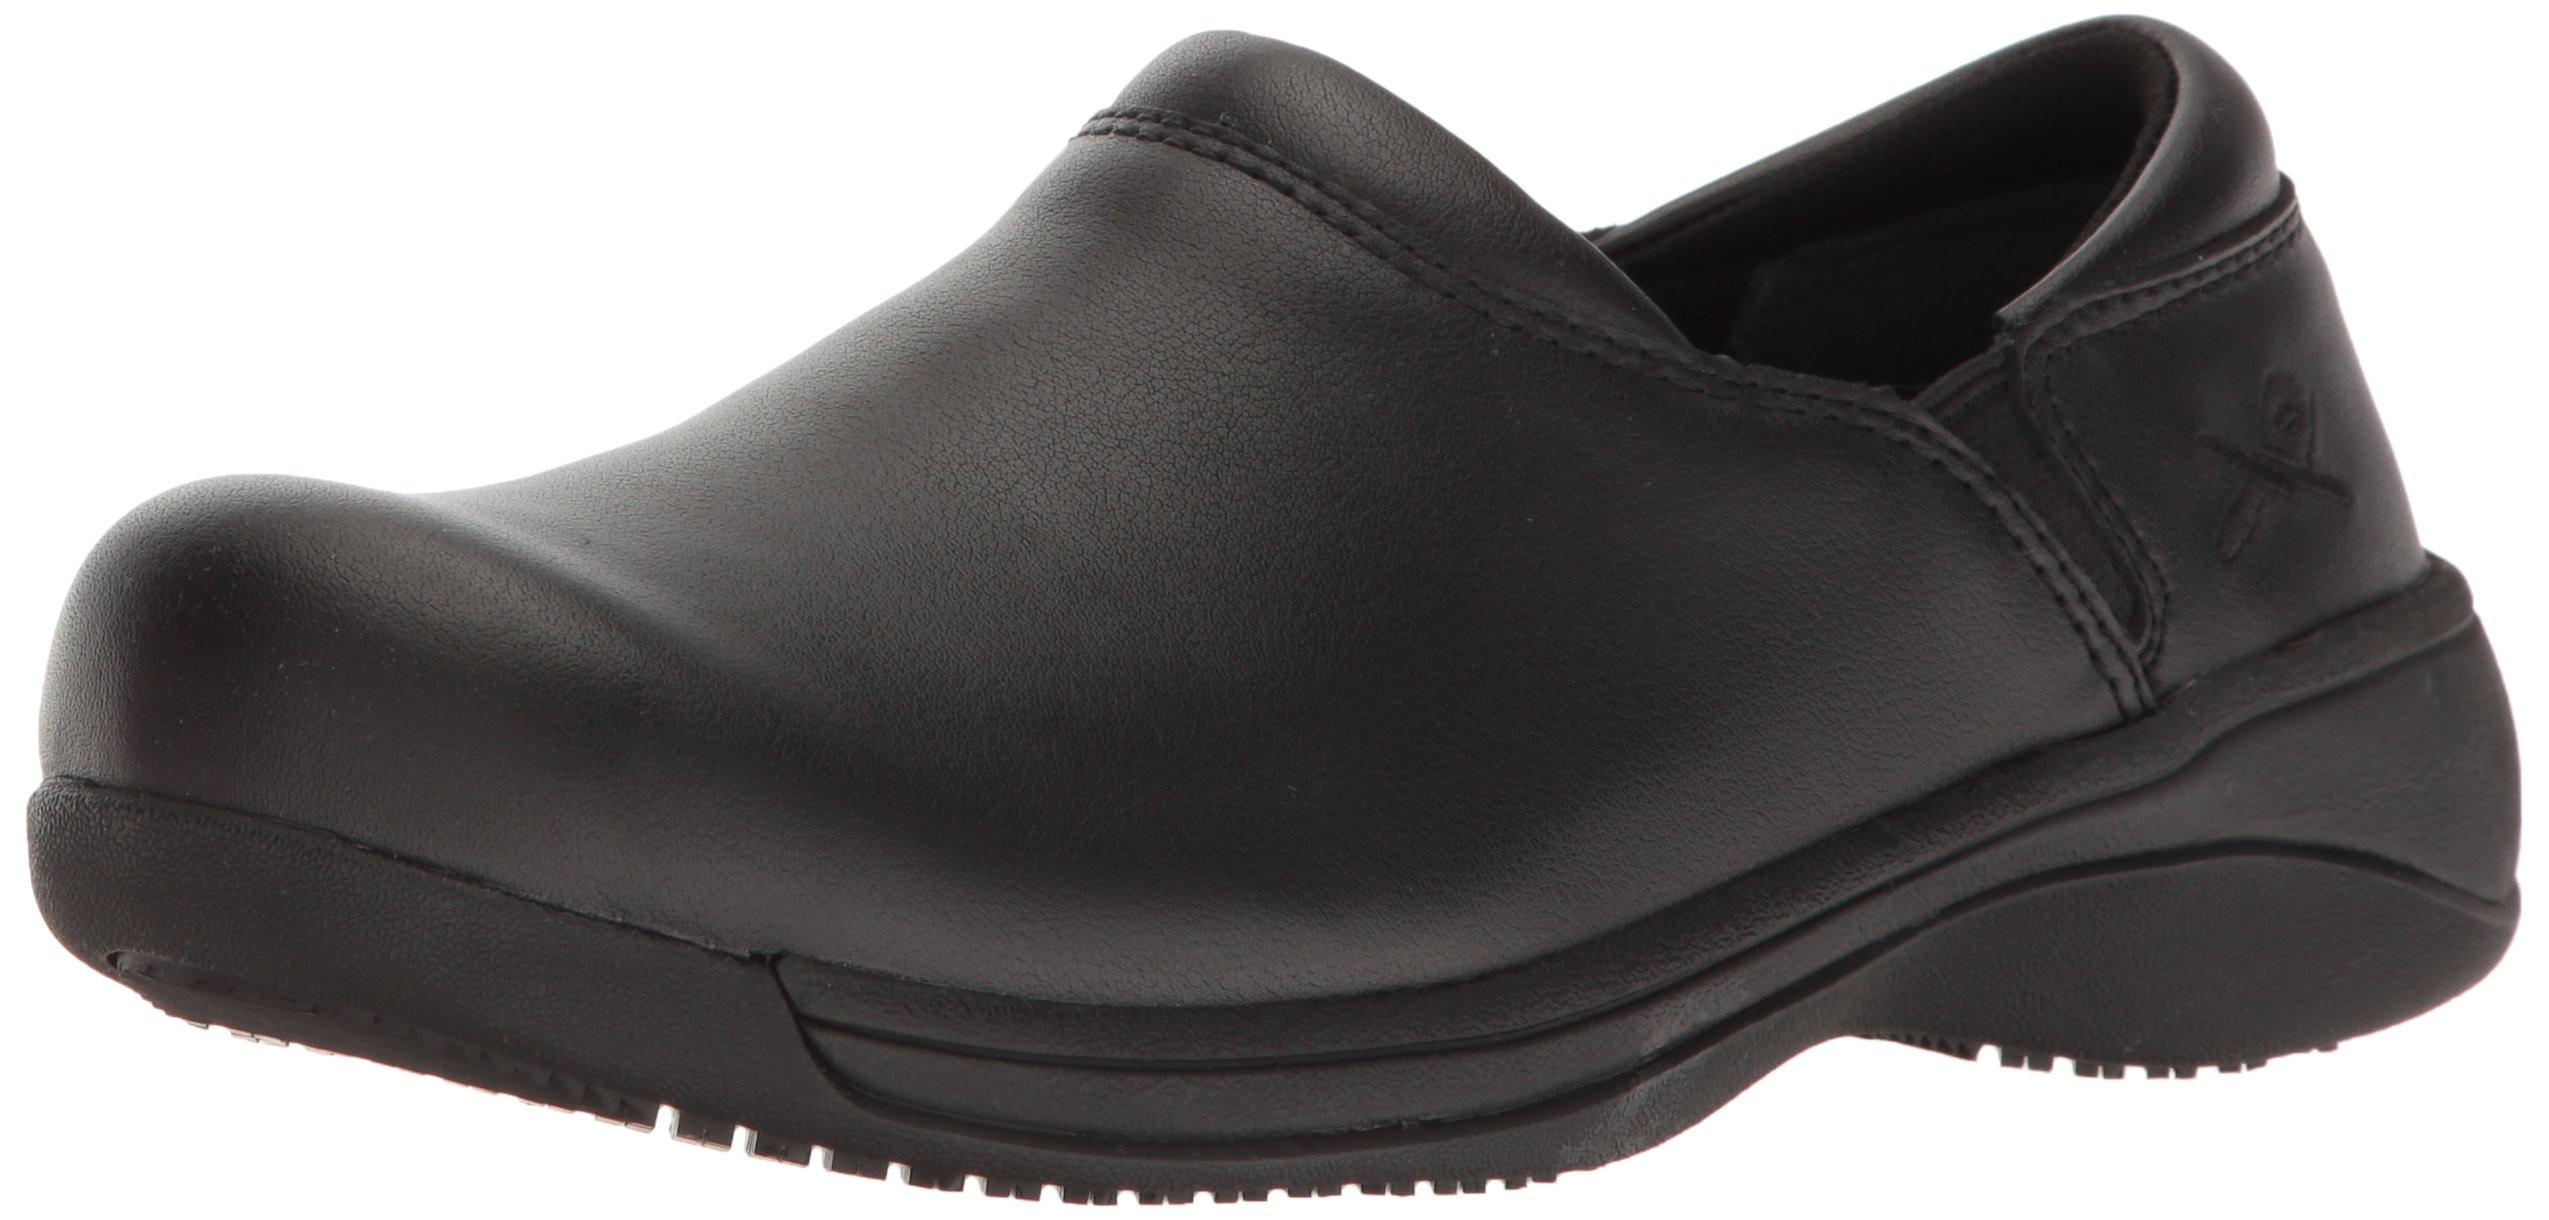 MOZO Women's Forza Food Service Shoe, Black, 9.5 B US by MOZO